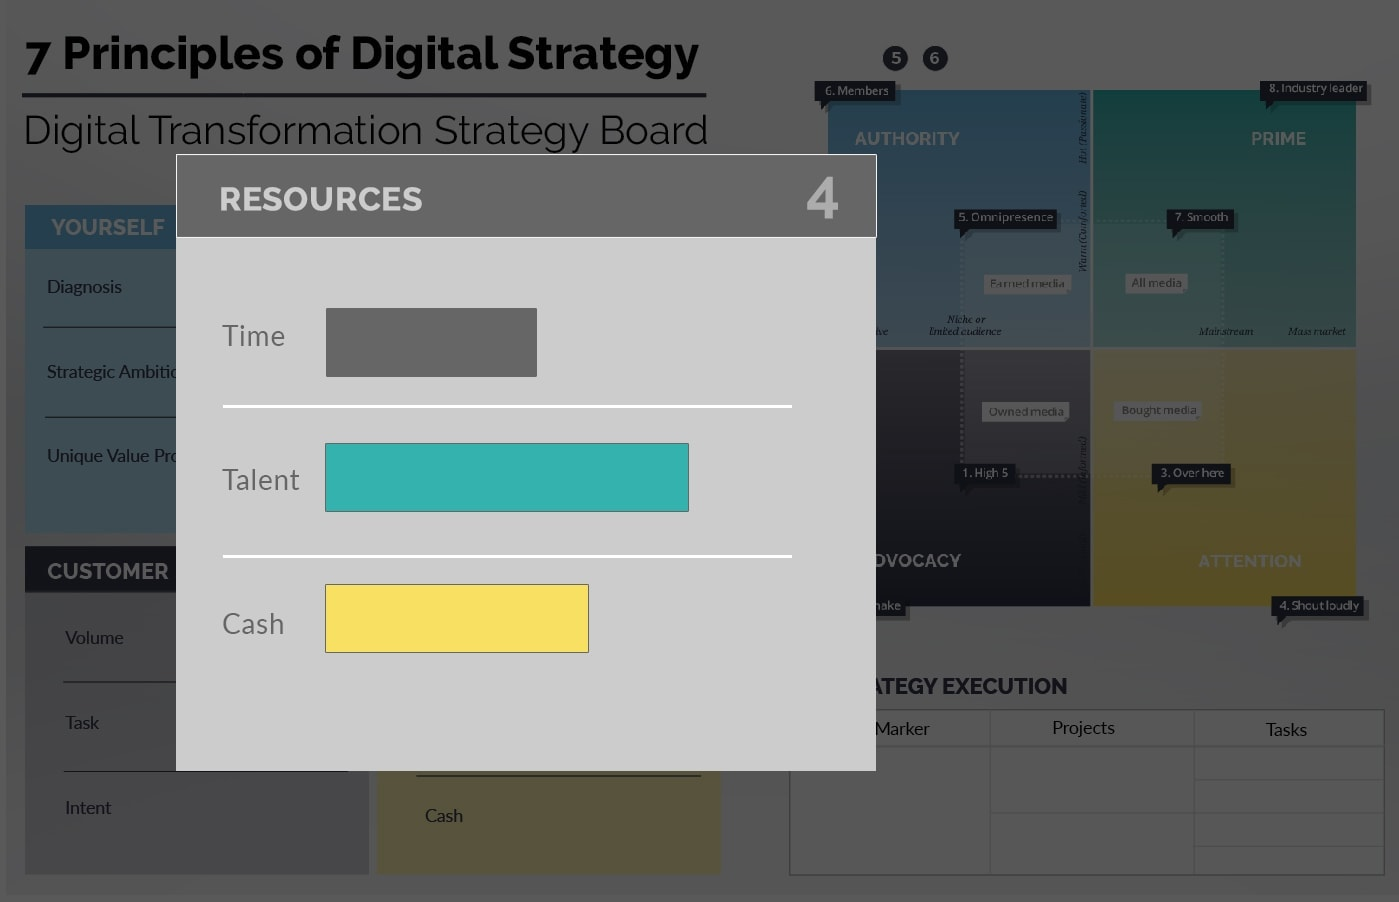 Ionology Digital Transformation Framework - Resources